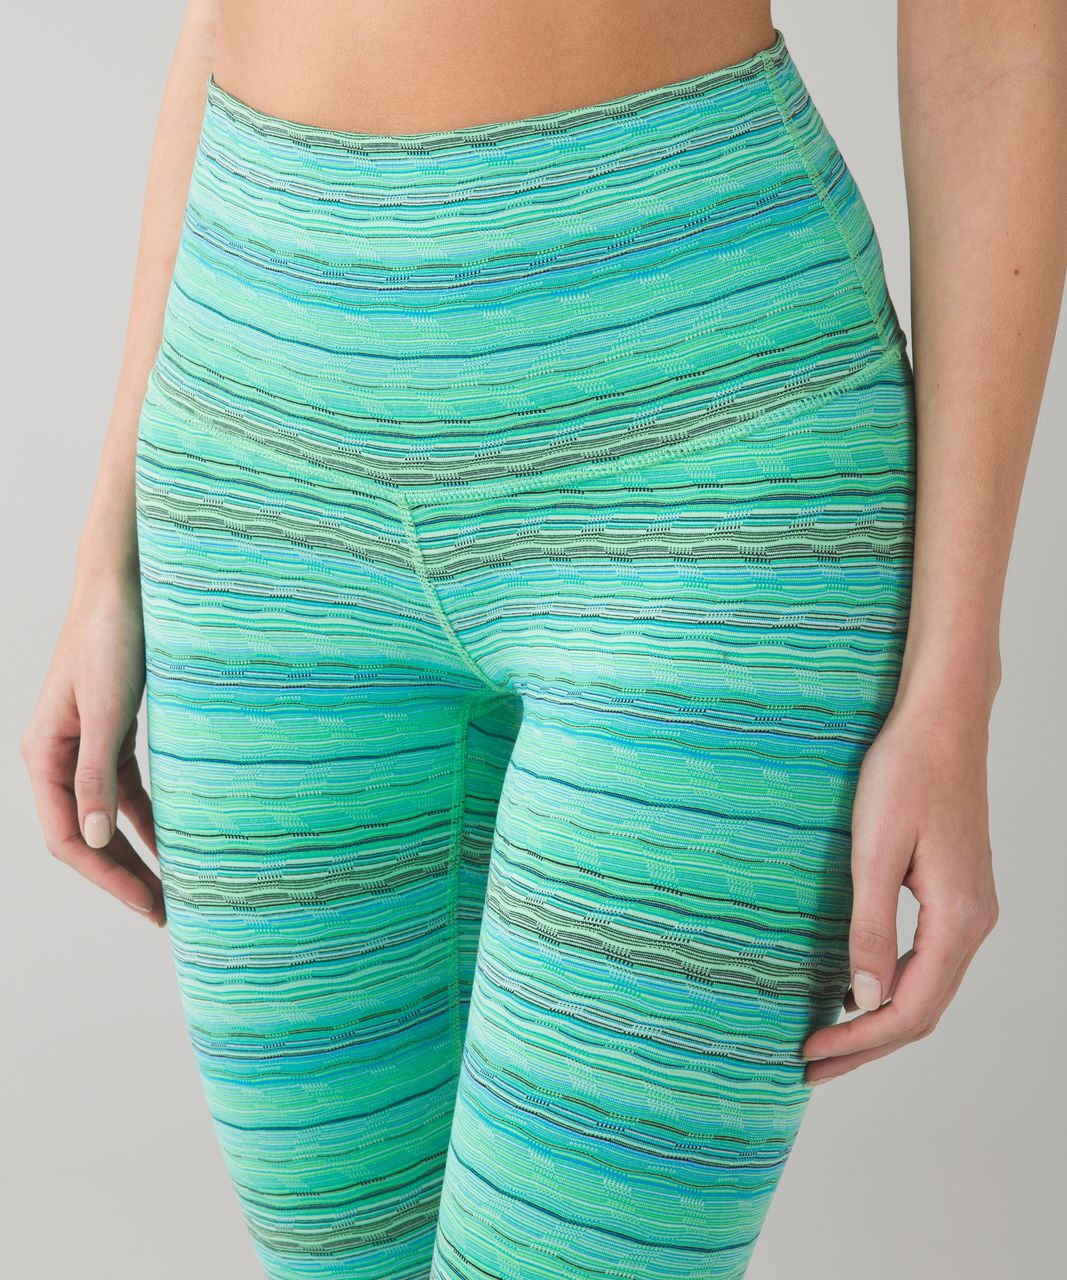 Lululemon Wunder Under Pant (Hi-Rise) - Space Dye Twist 6 Colour Dragonfly Naval Blue